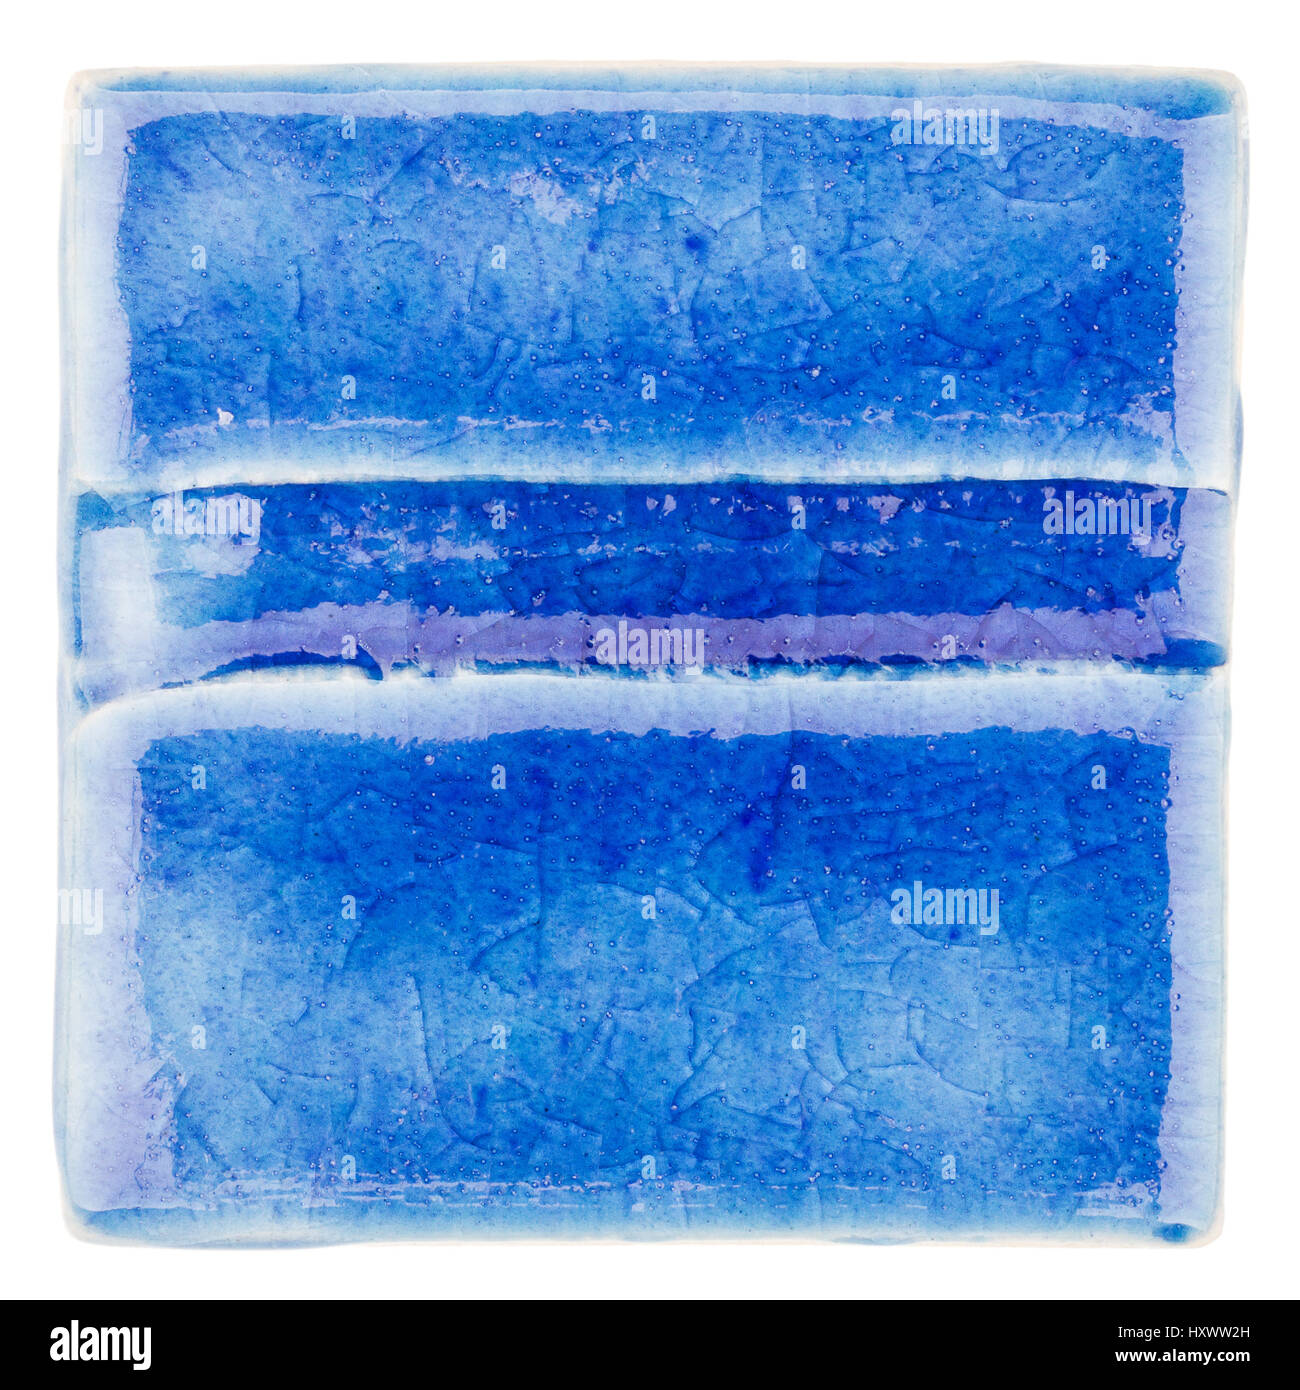 Blue lined handmade glazed ceramic tile isolated on white blue lined handmade glazed ceramic tile isolated on white background dailygadgetfo Choice Image